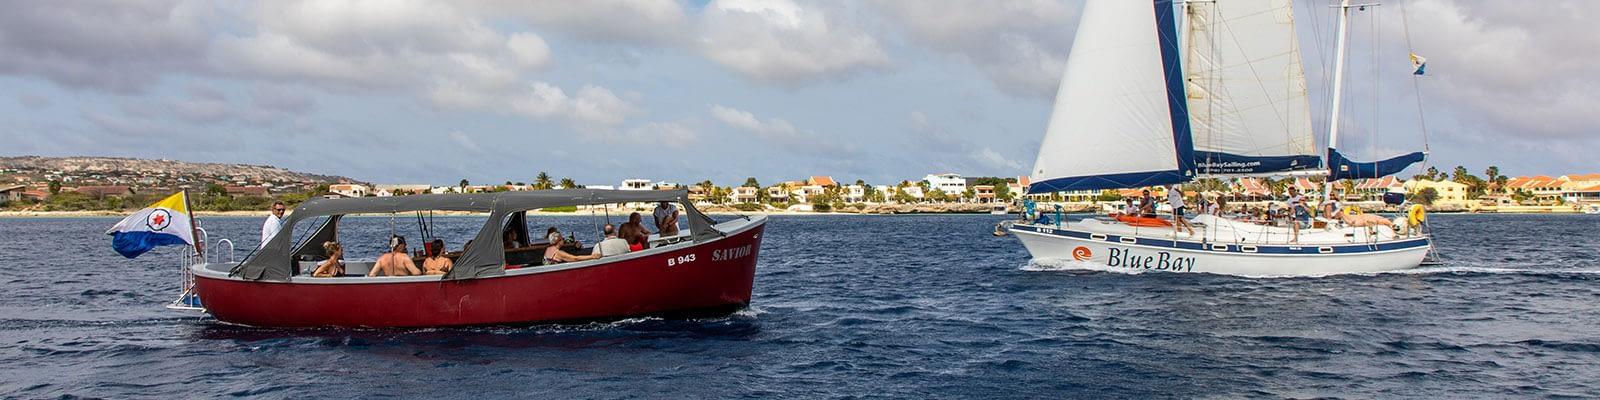 blue-bay-bonaire-sailing-slider-1